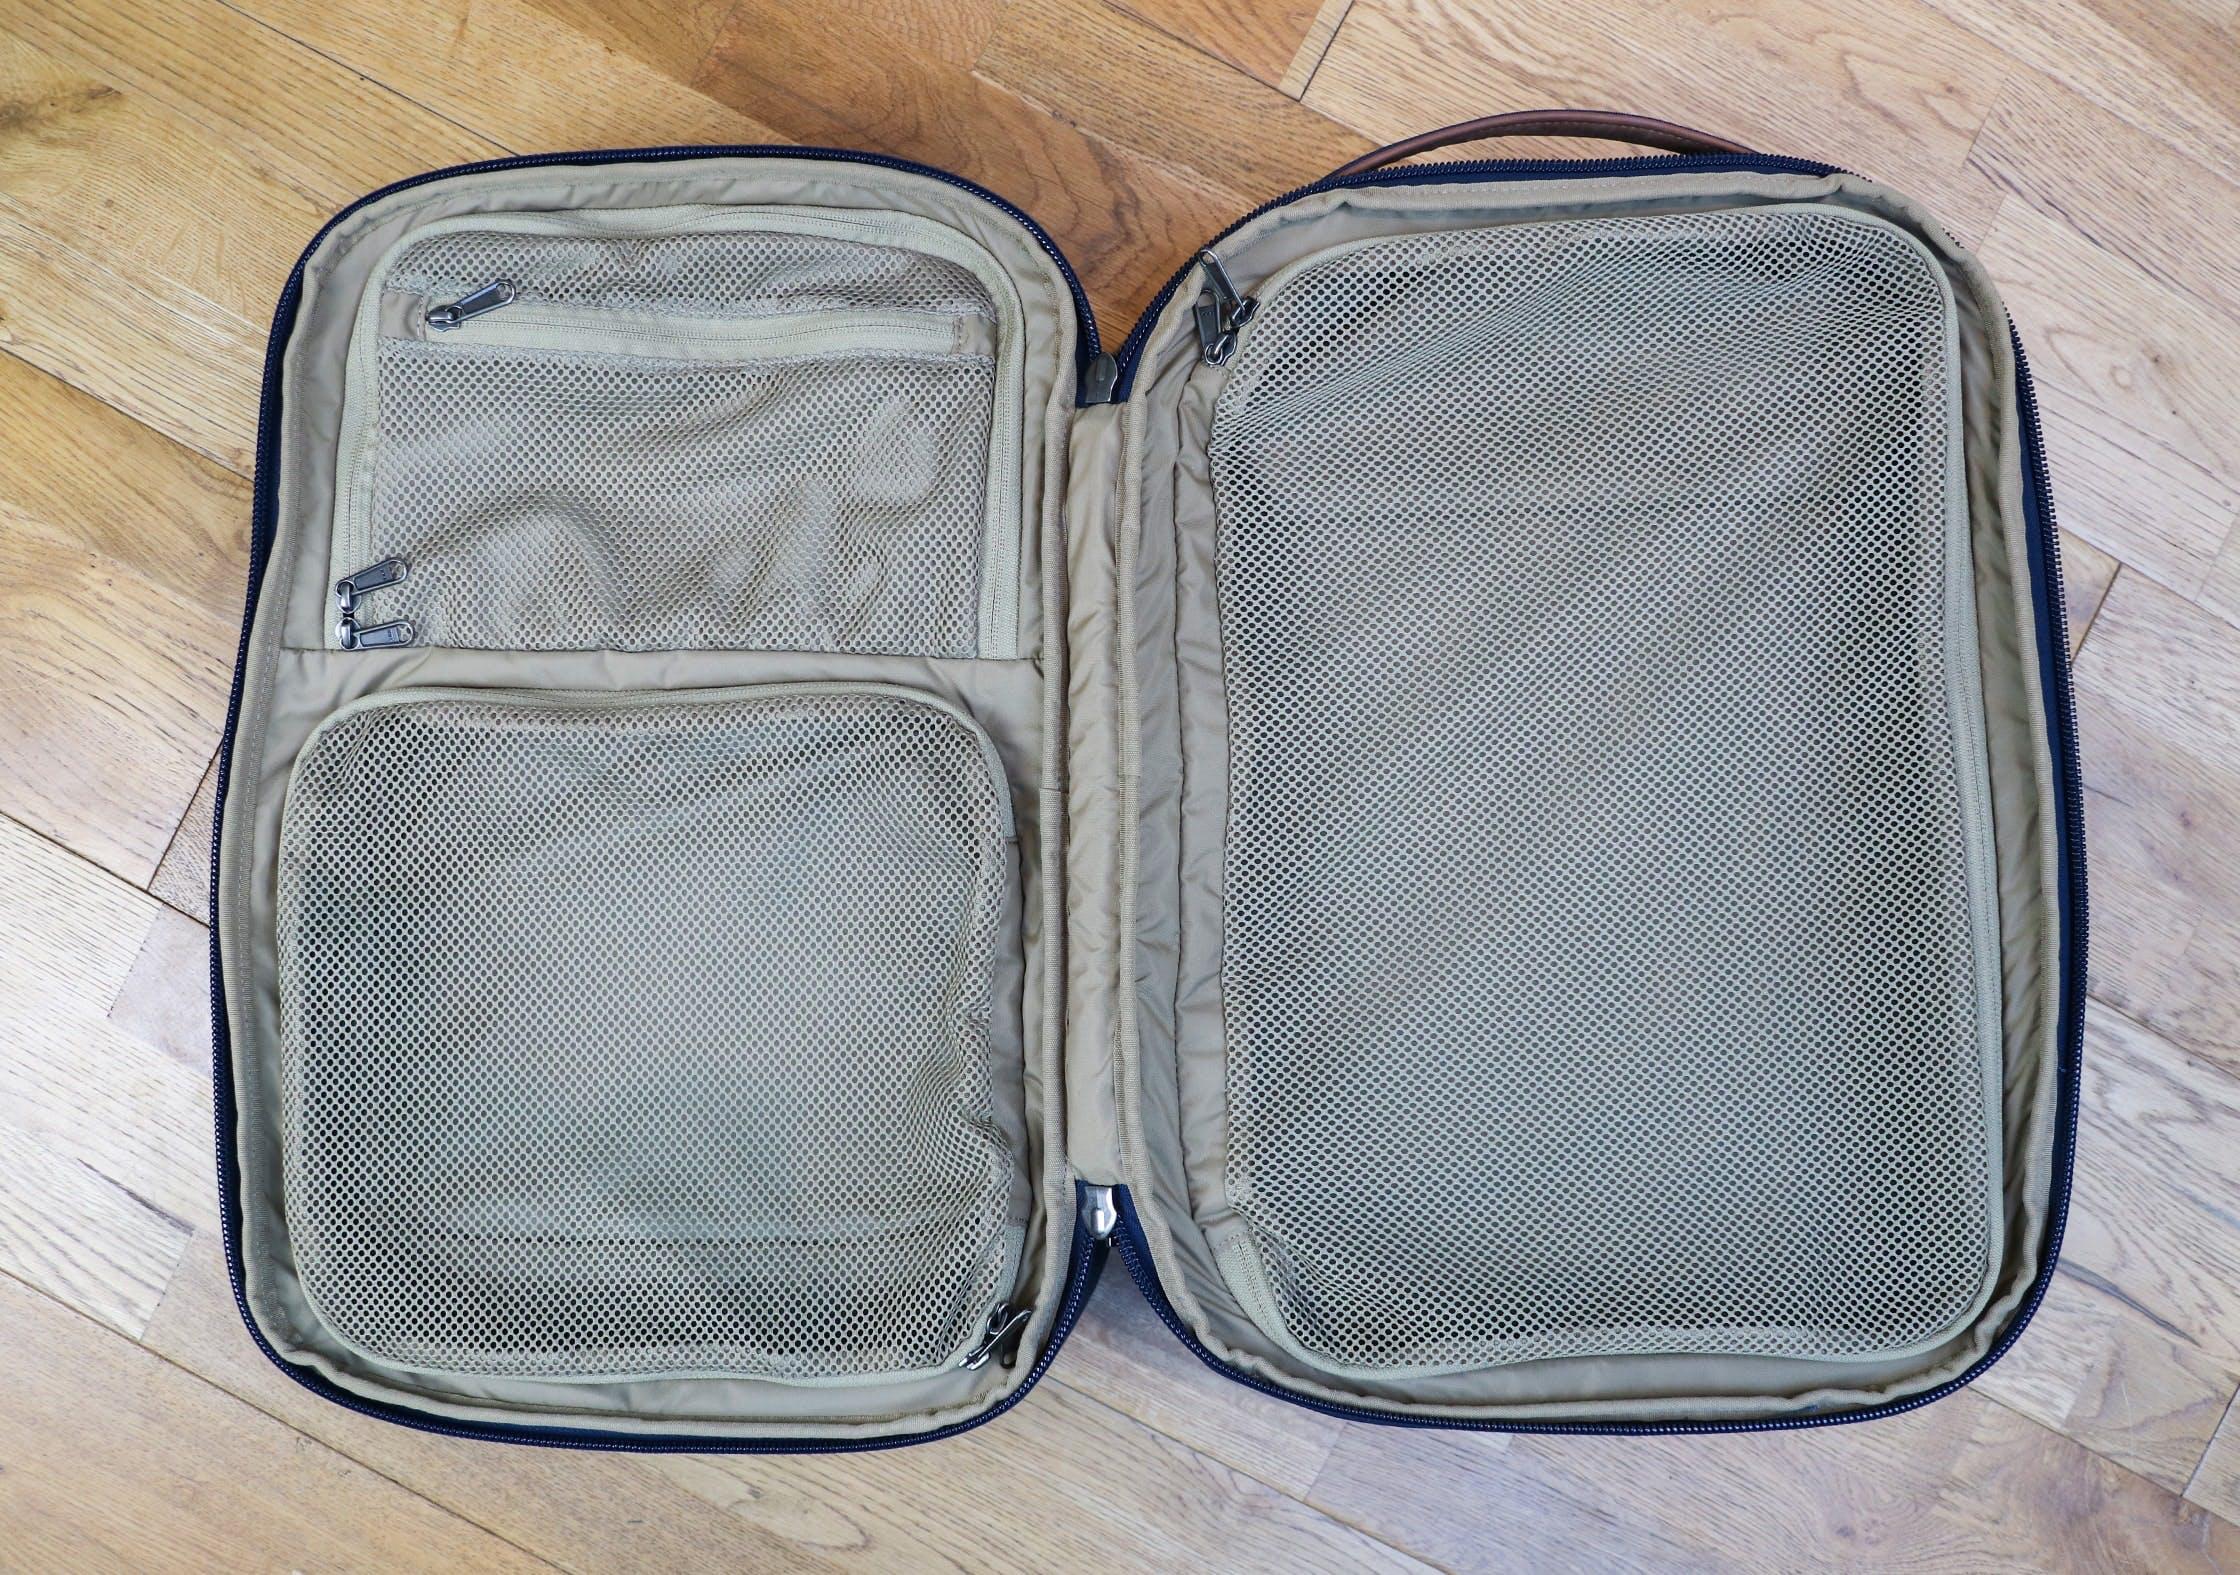 Fjallraven Travel Pack Internal Organization 70c791f7d82a1